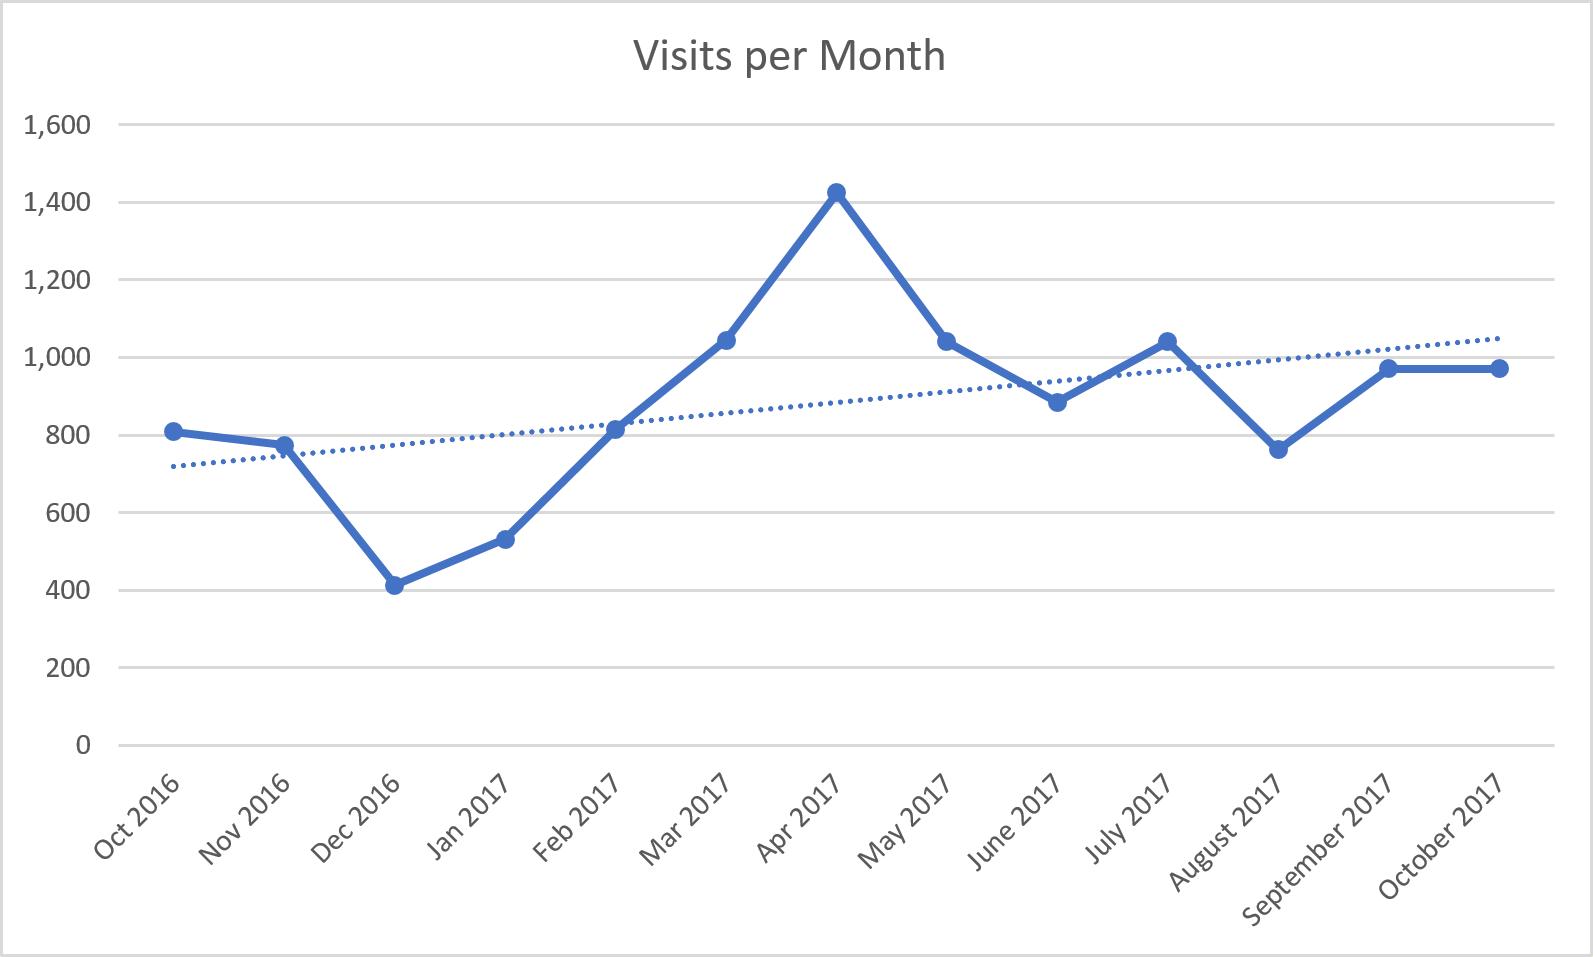 Visits per month